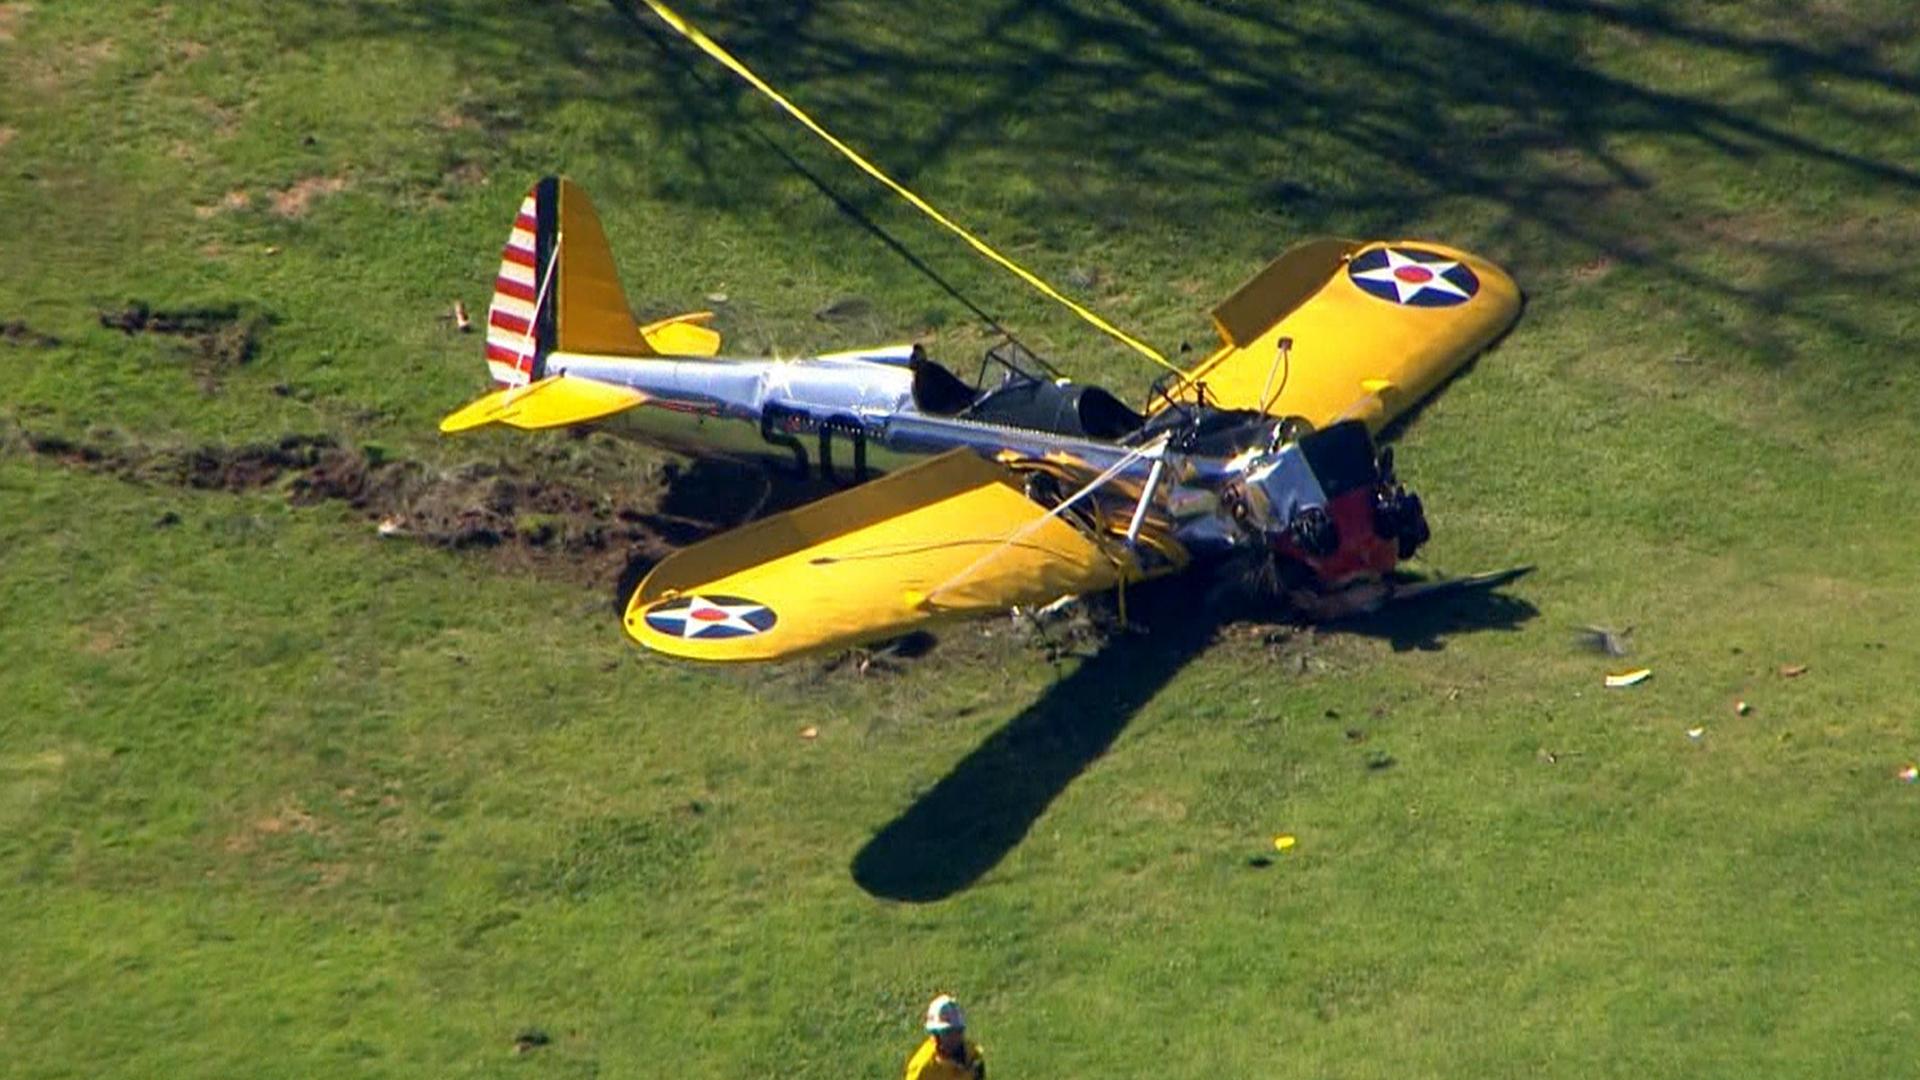 Harrison Ford Plane Crash: NTSB Issues Preliminary Report